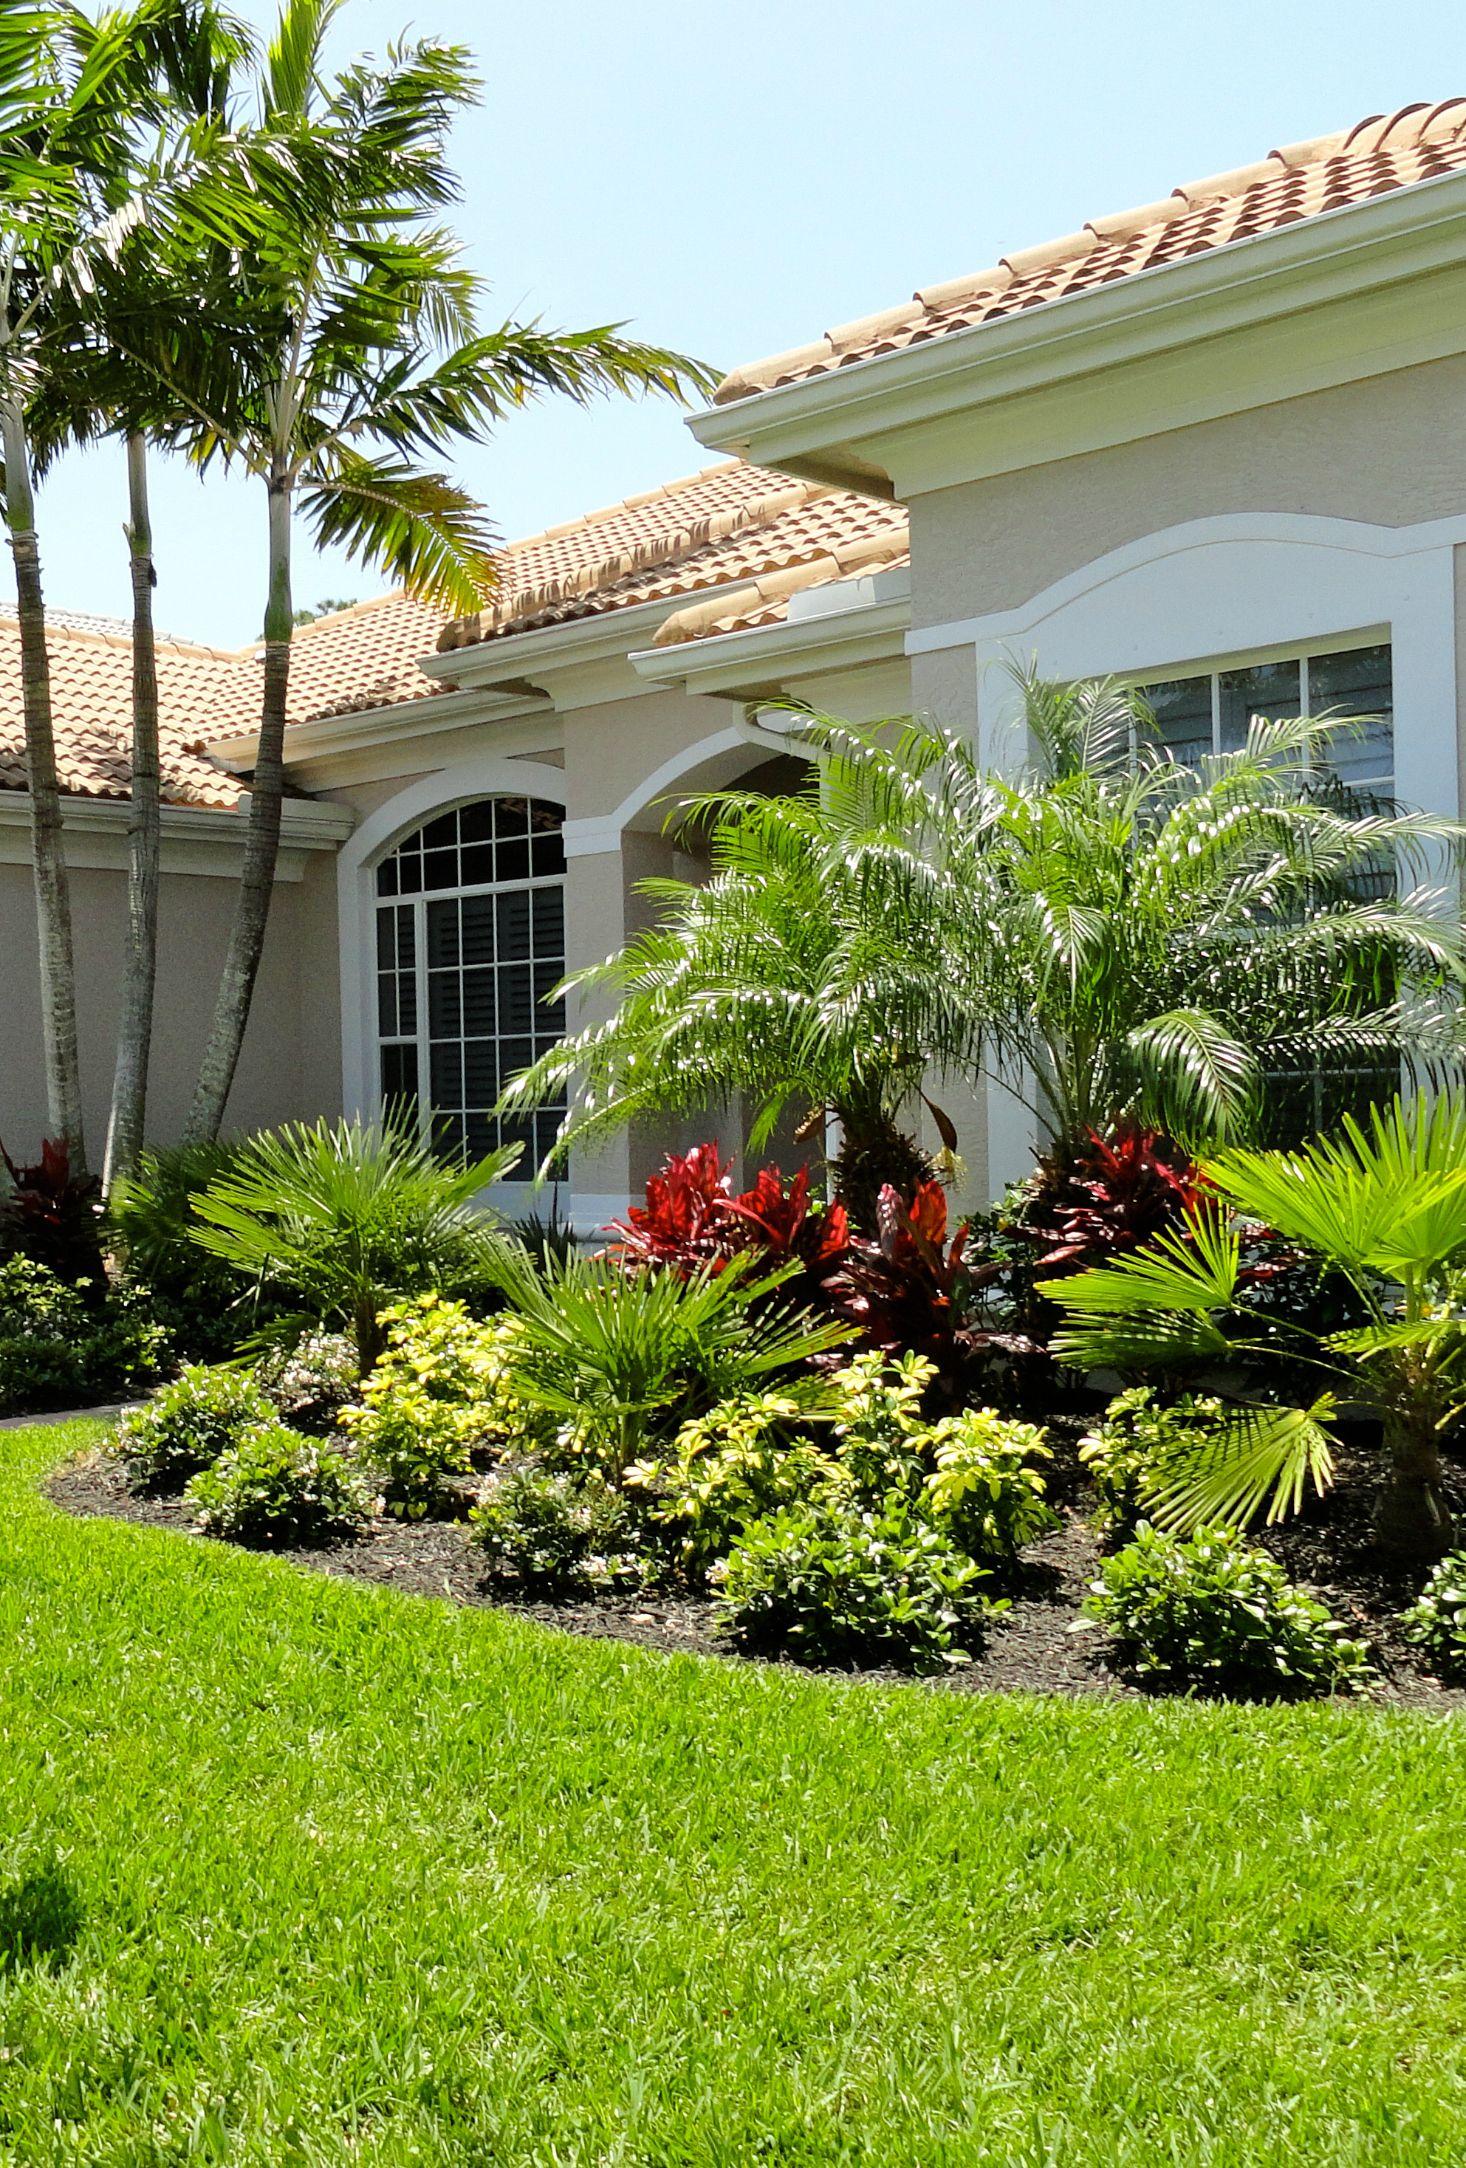 . Popular Backyard Landscape Design for an Appealing